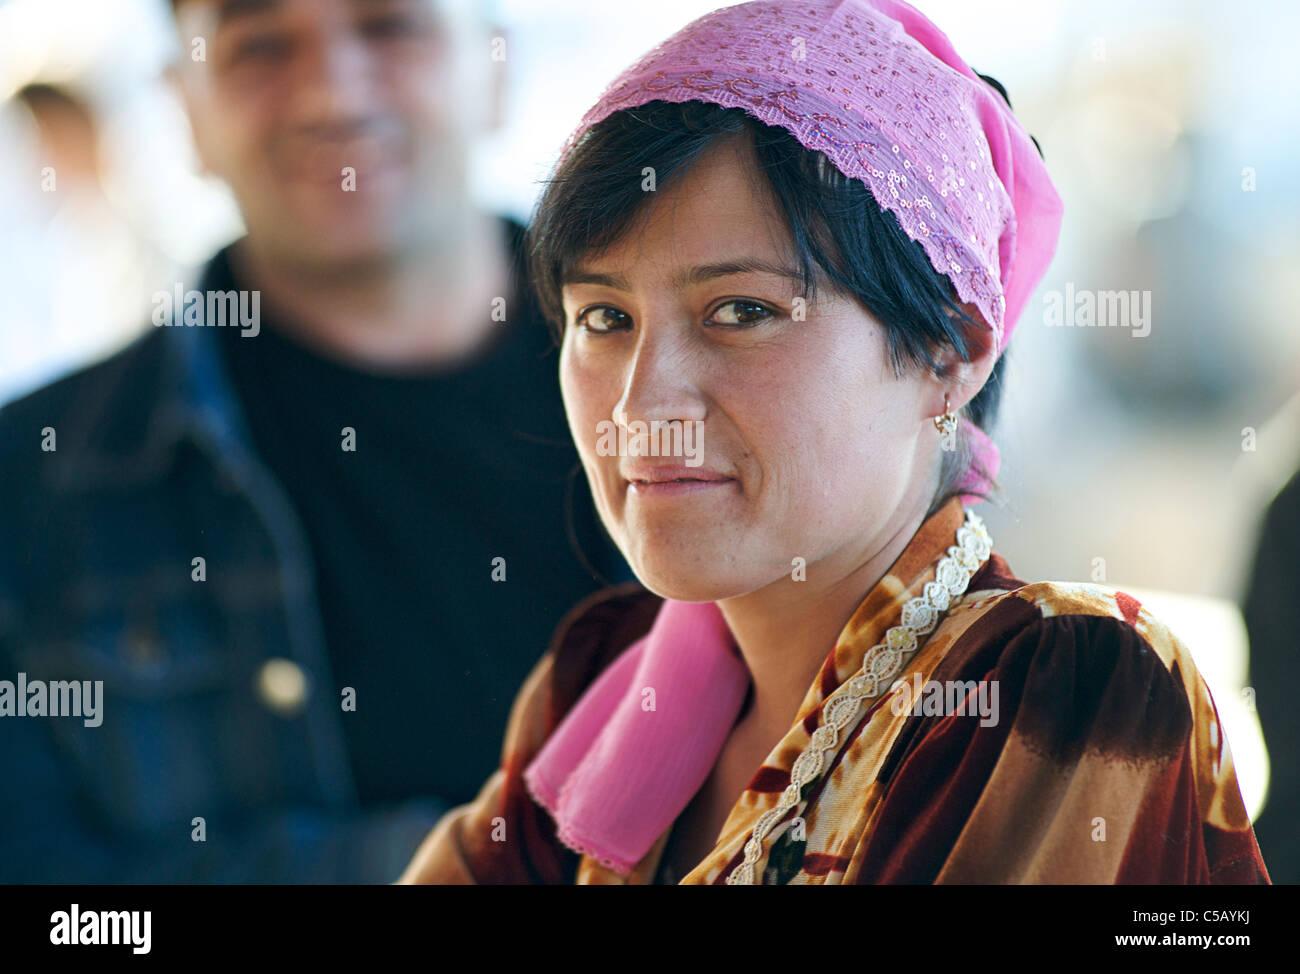 Portrait of Uzbeki market vendor Samarkand, Uzbekistan - Stock Image